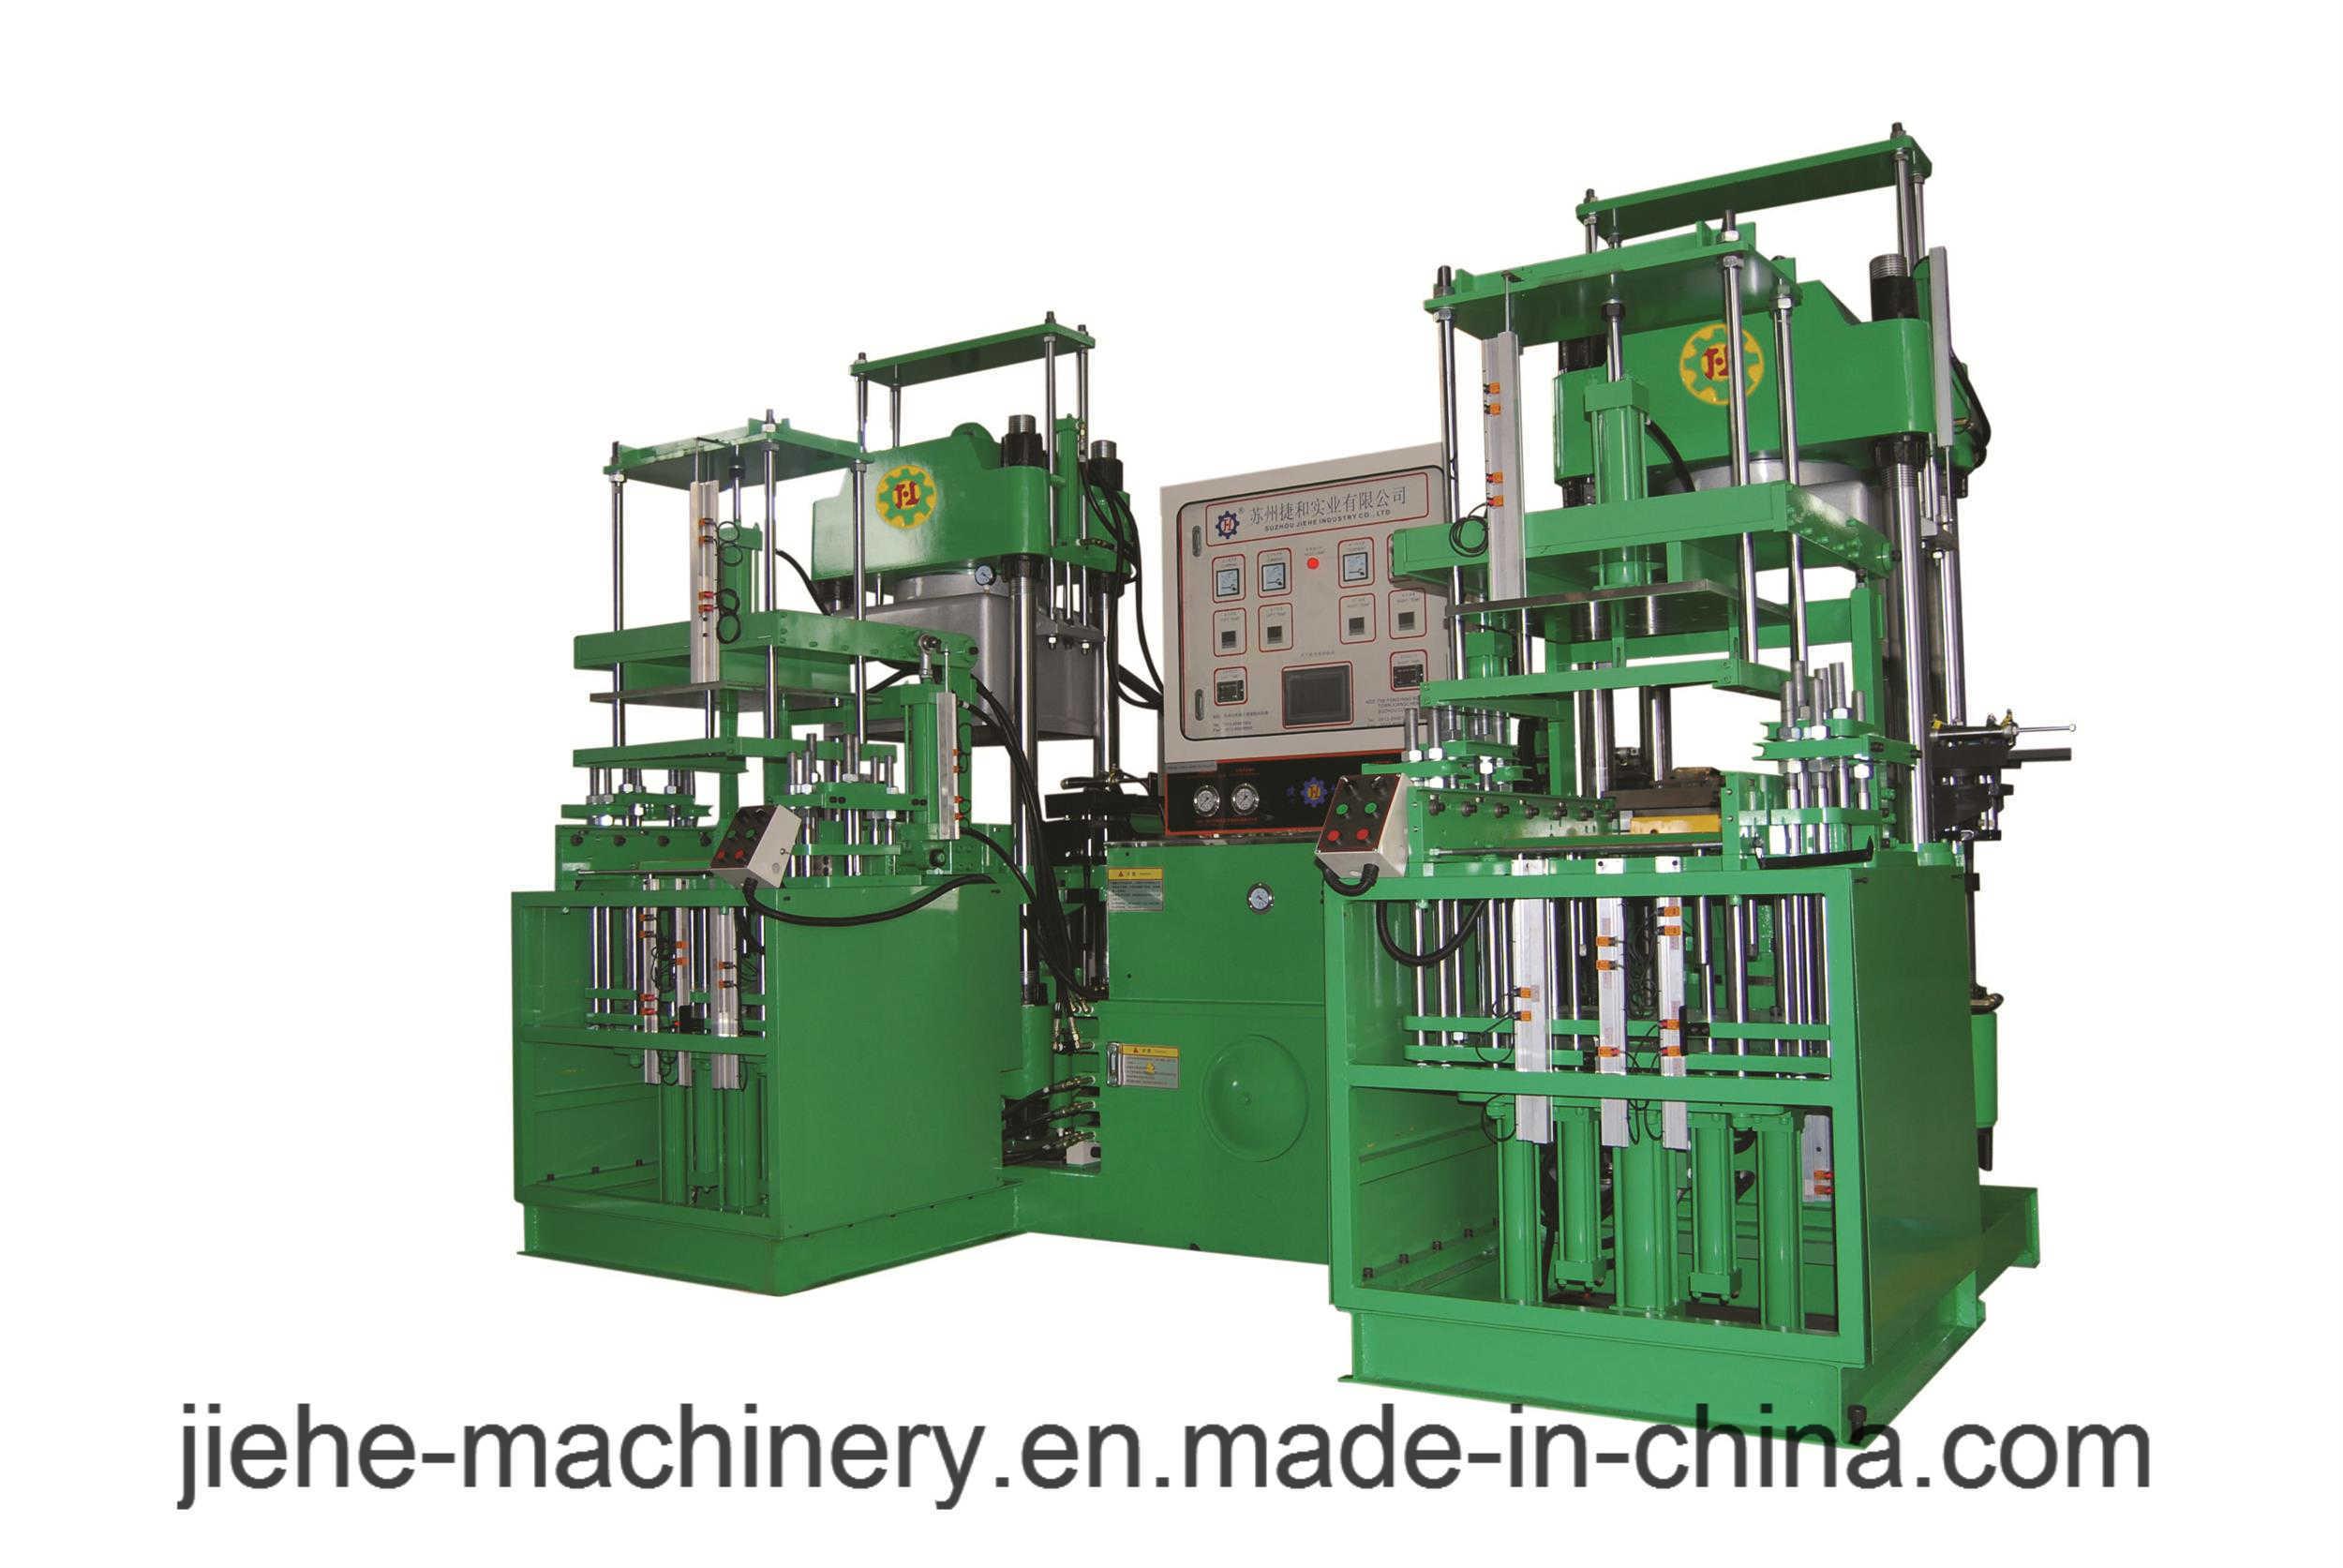 Automatic Rubber Machine Oil Seal Machine